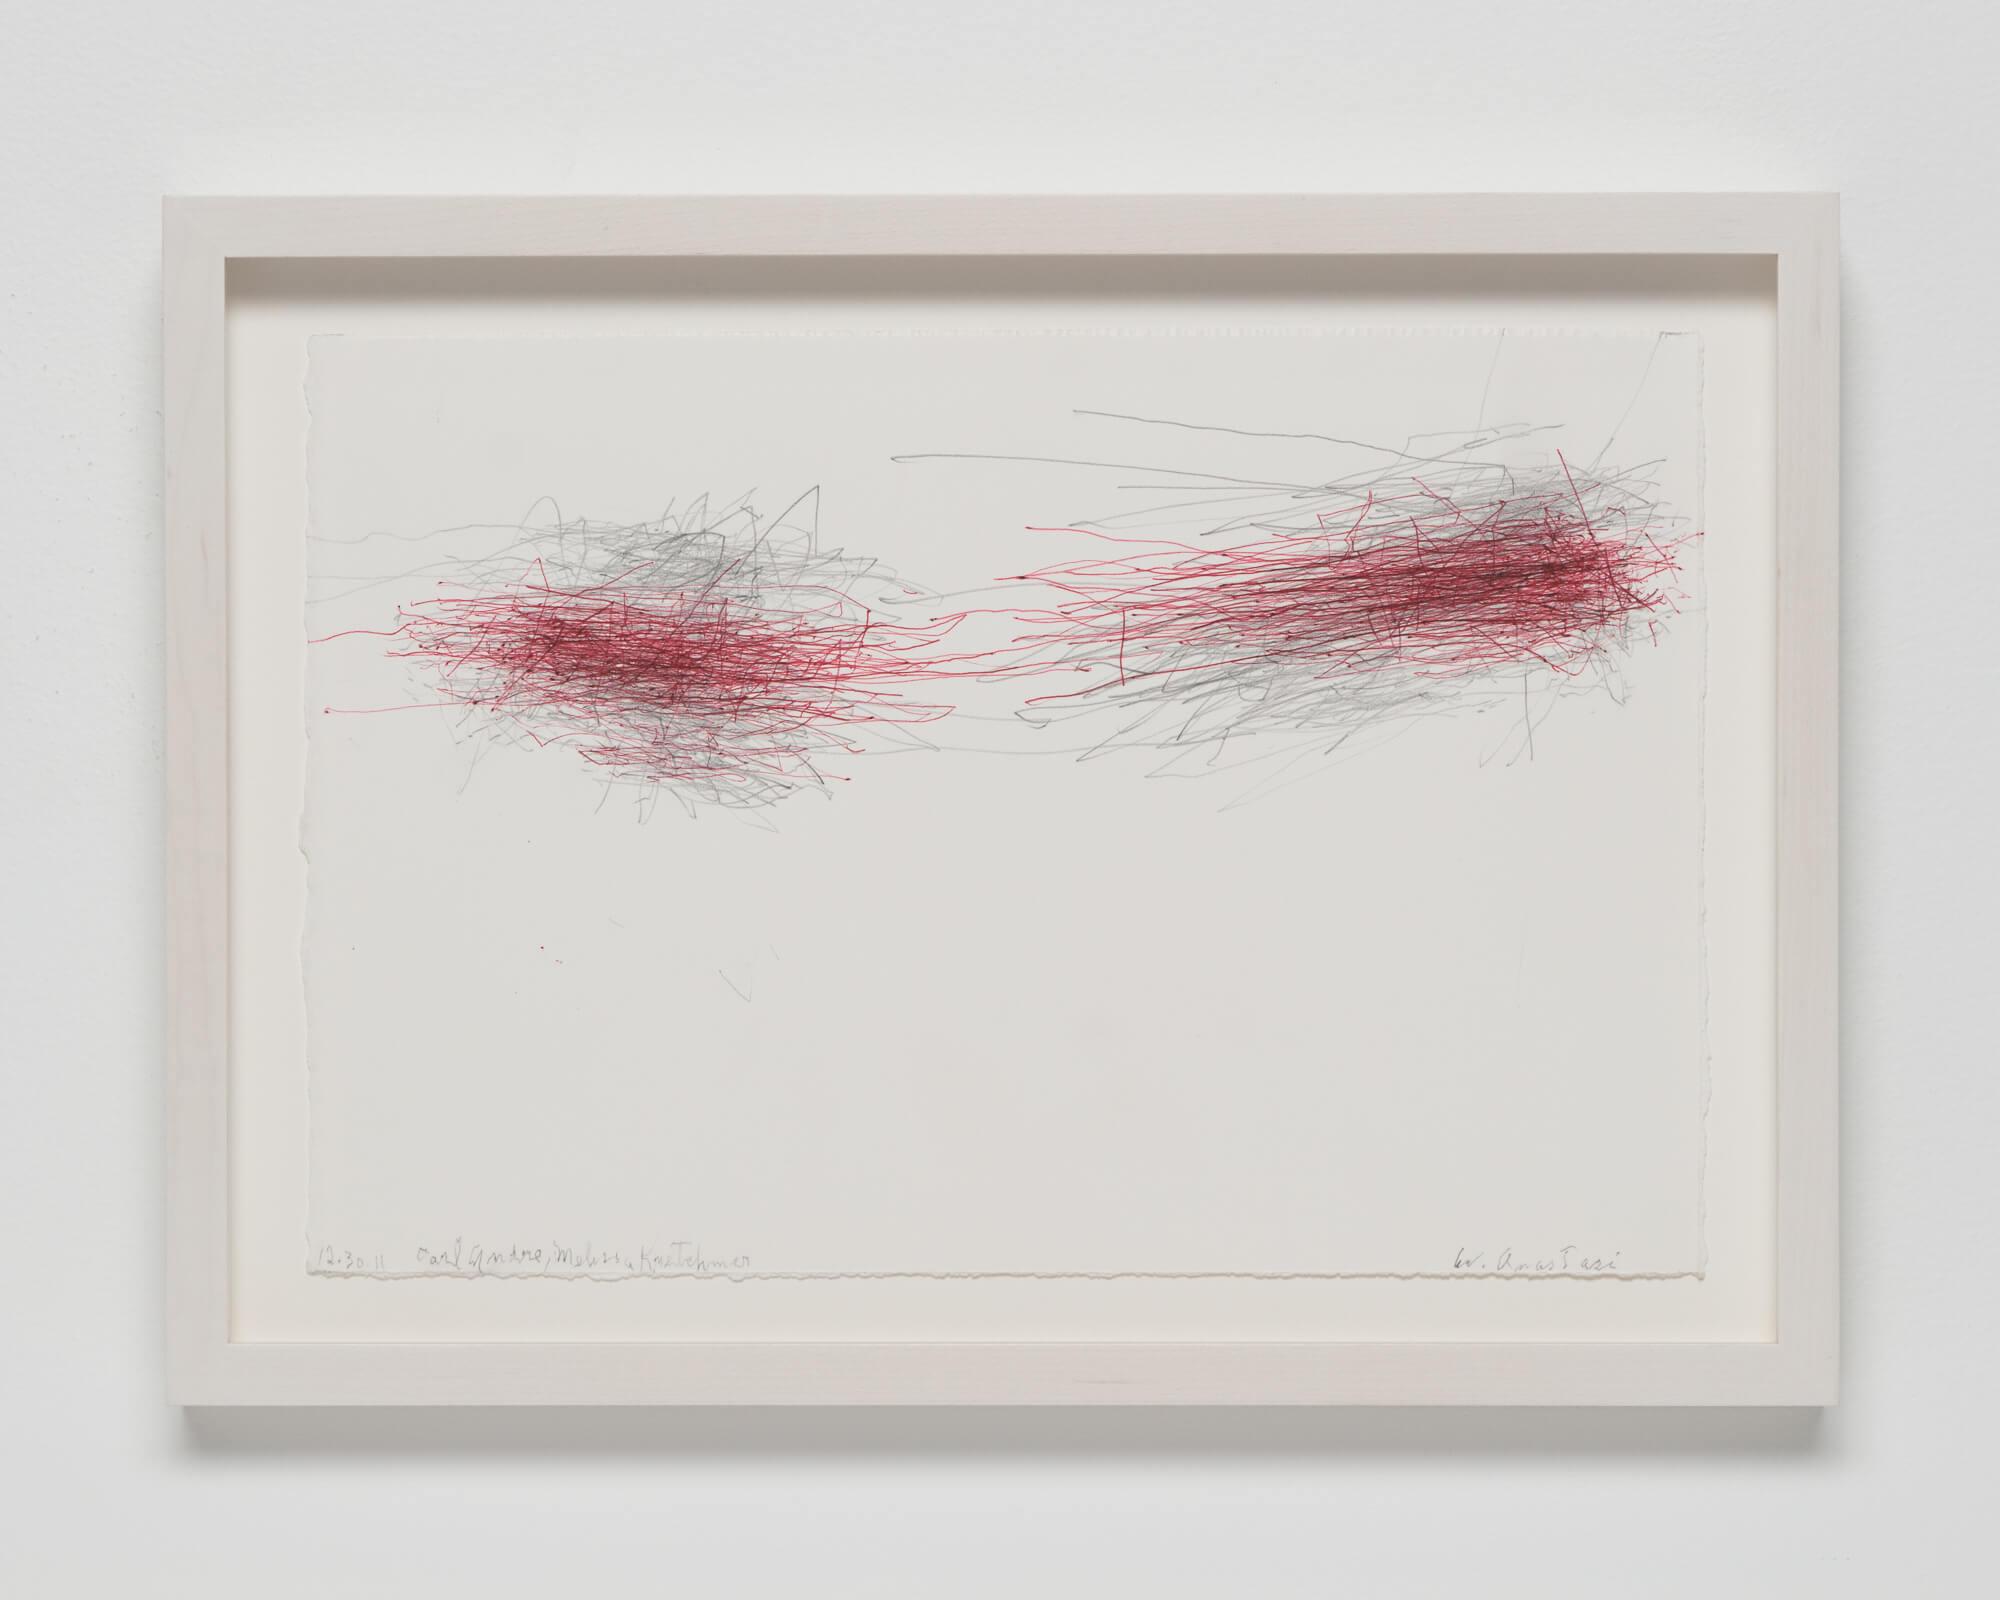 Anastasi, Untitled (Subway Drawing, 12.30.11, Carl Andre, Melissa Kretschmer), 2011 (WA 11.001) A